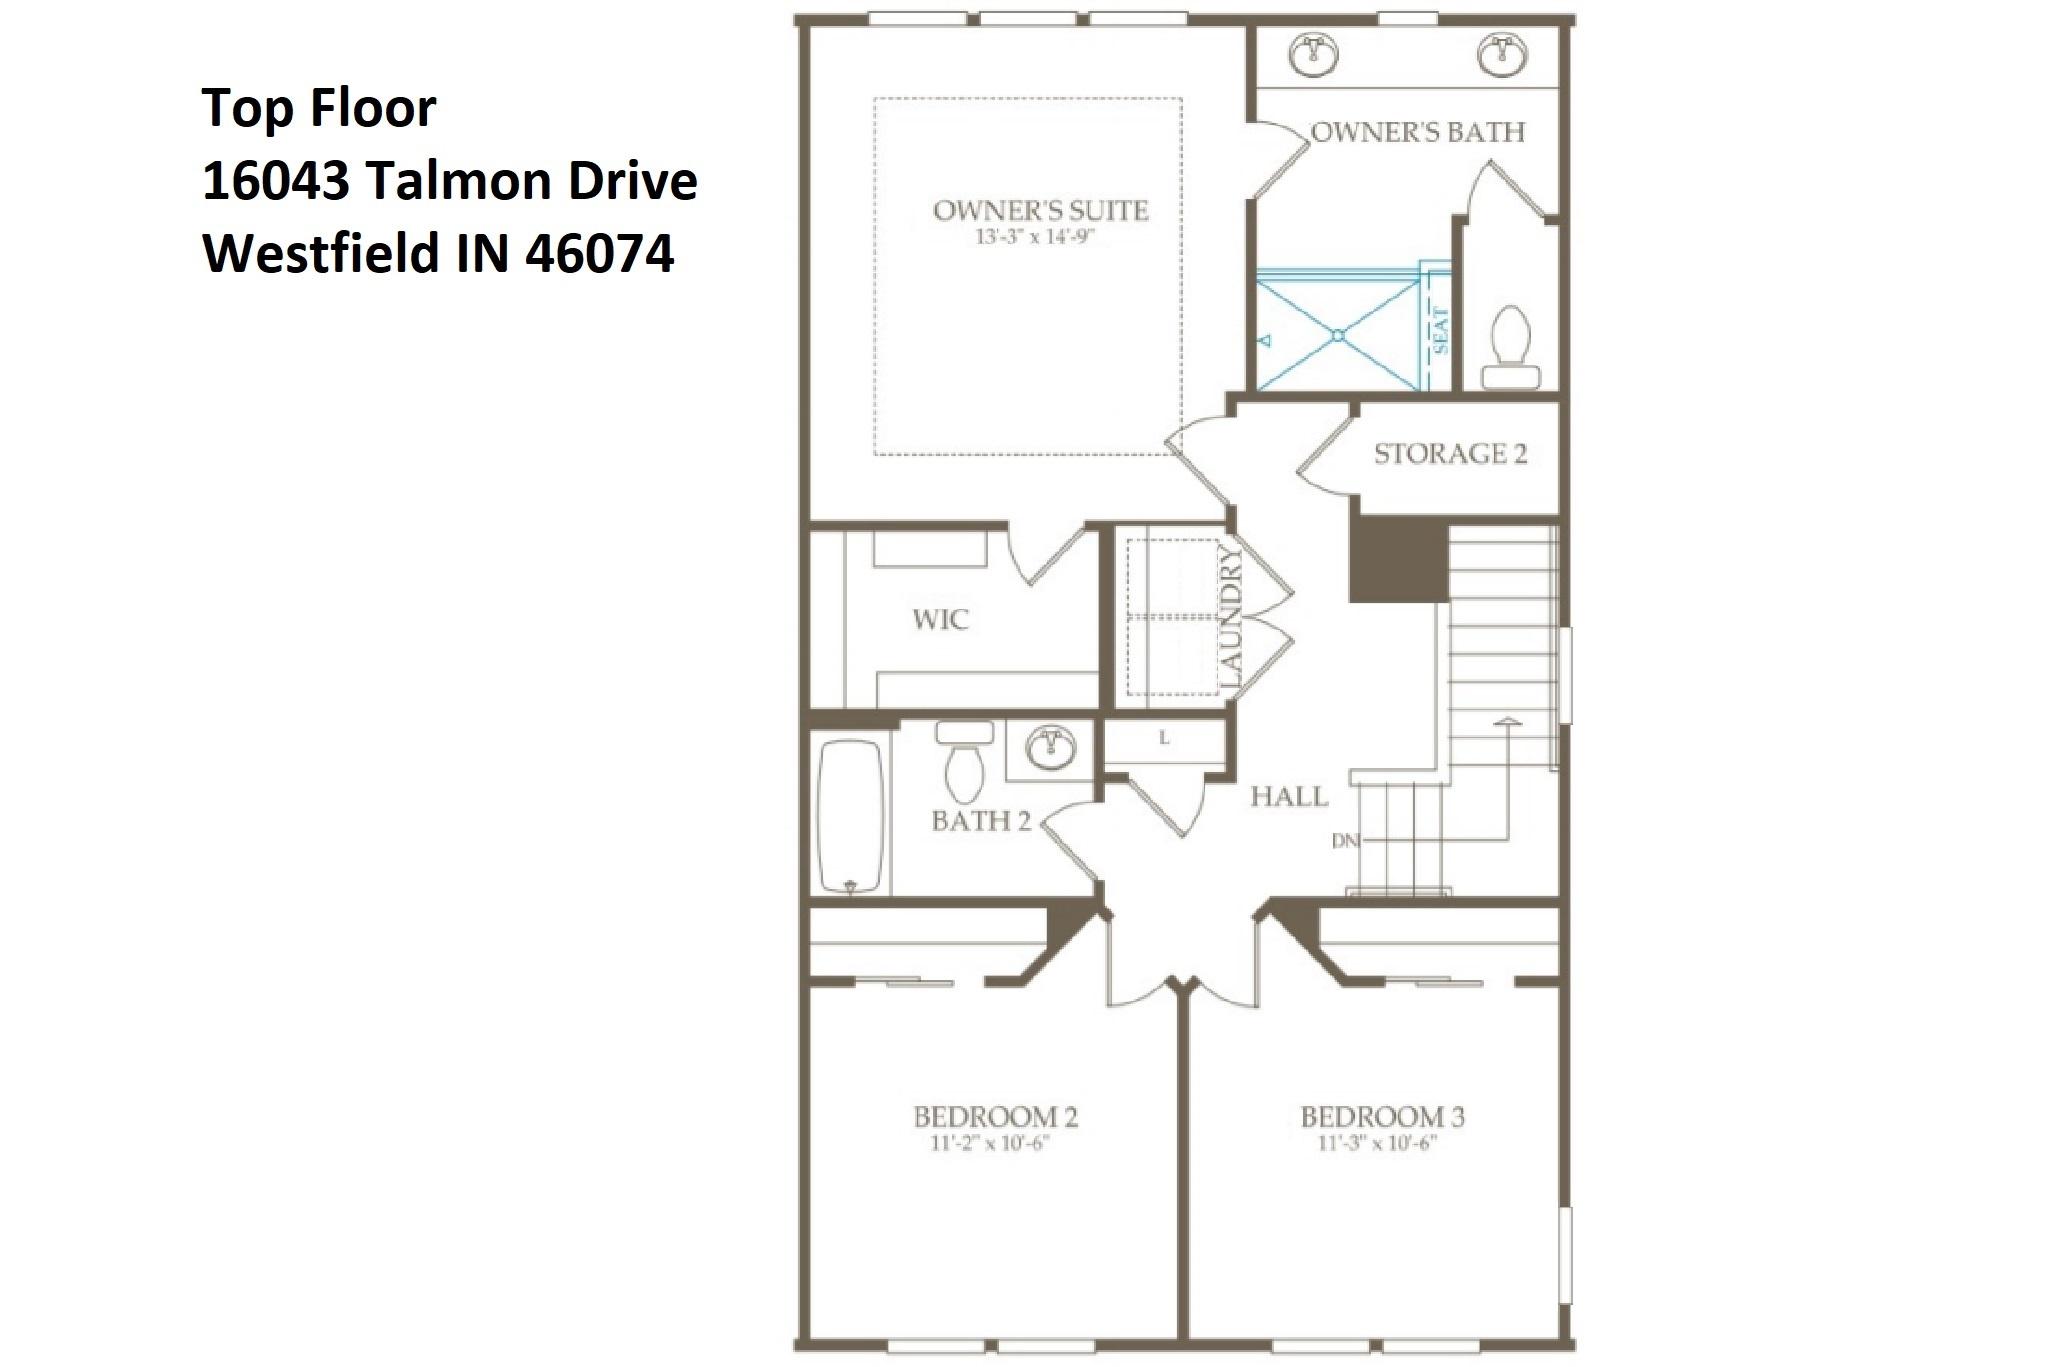 16043 Talmon Drive Westfield IN 46074 - KW-ToHelpUmove - BLC 21800916 - Mitch Rolsky (19)